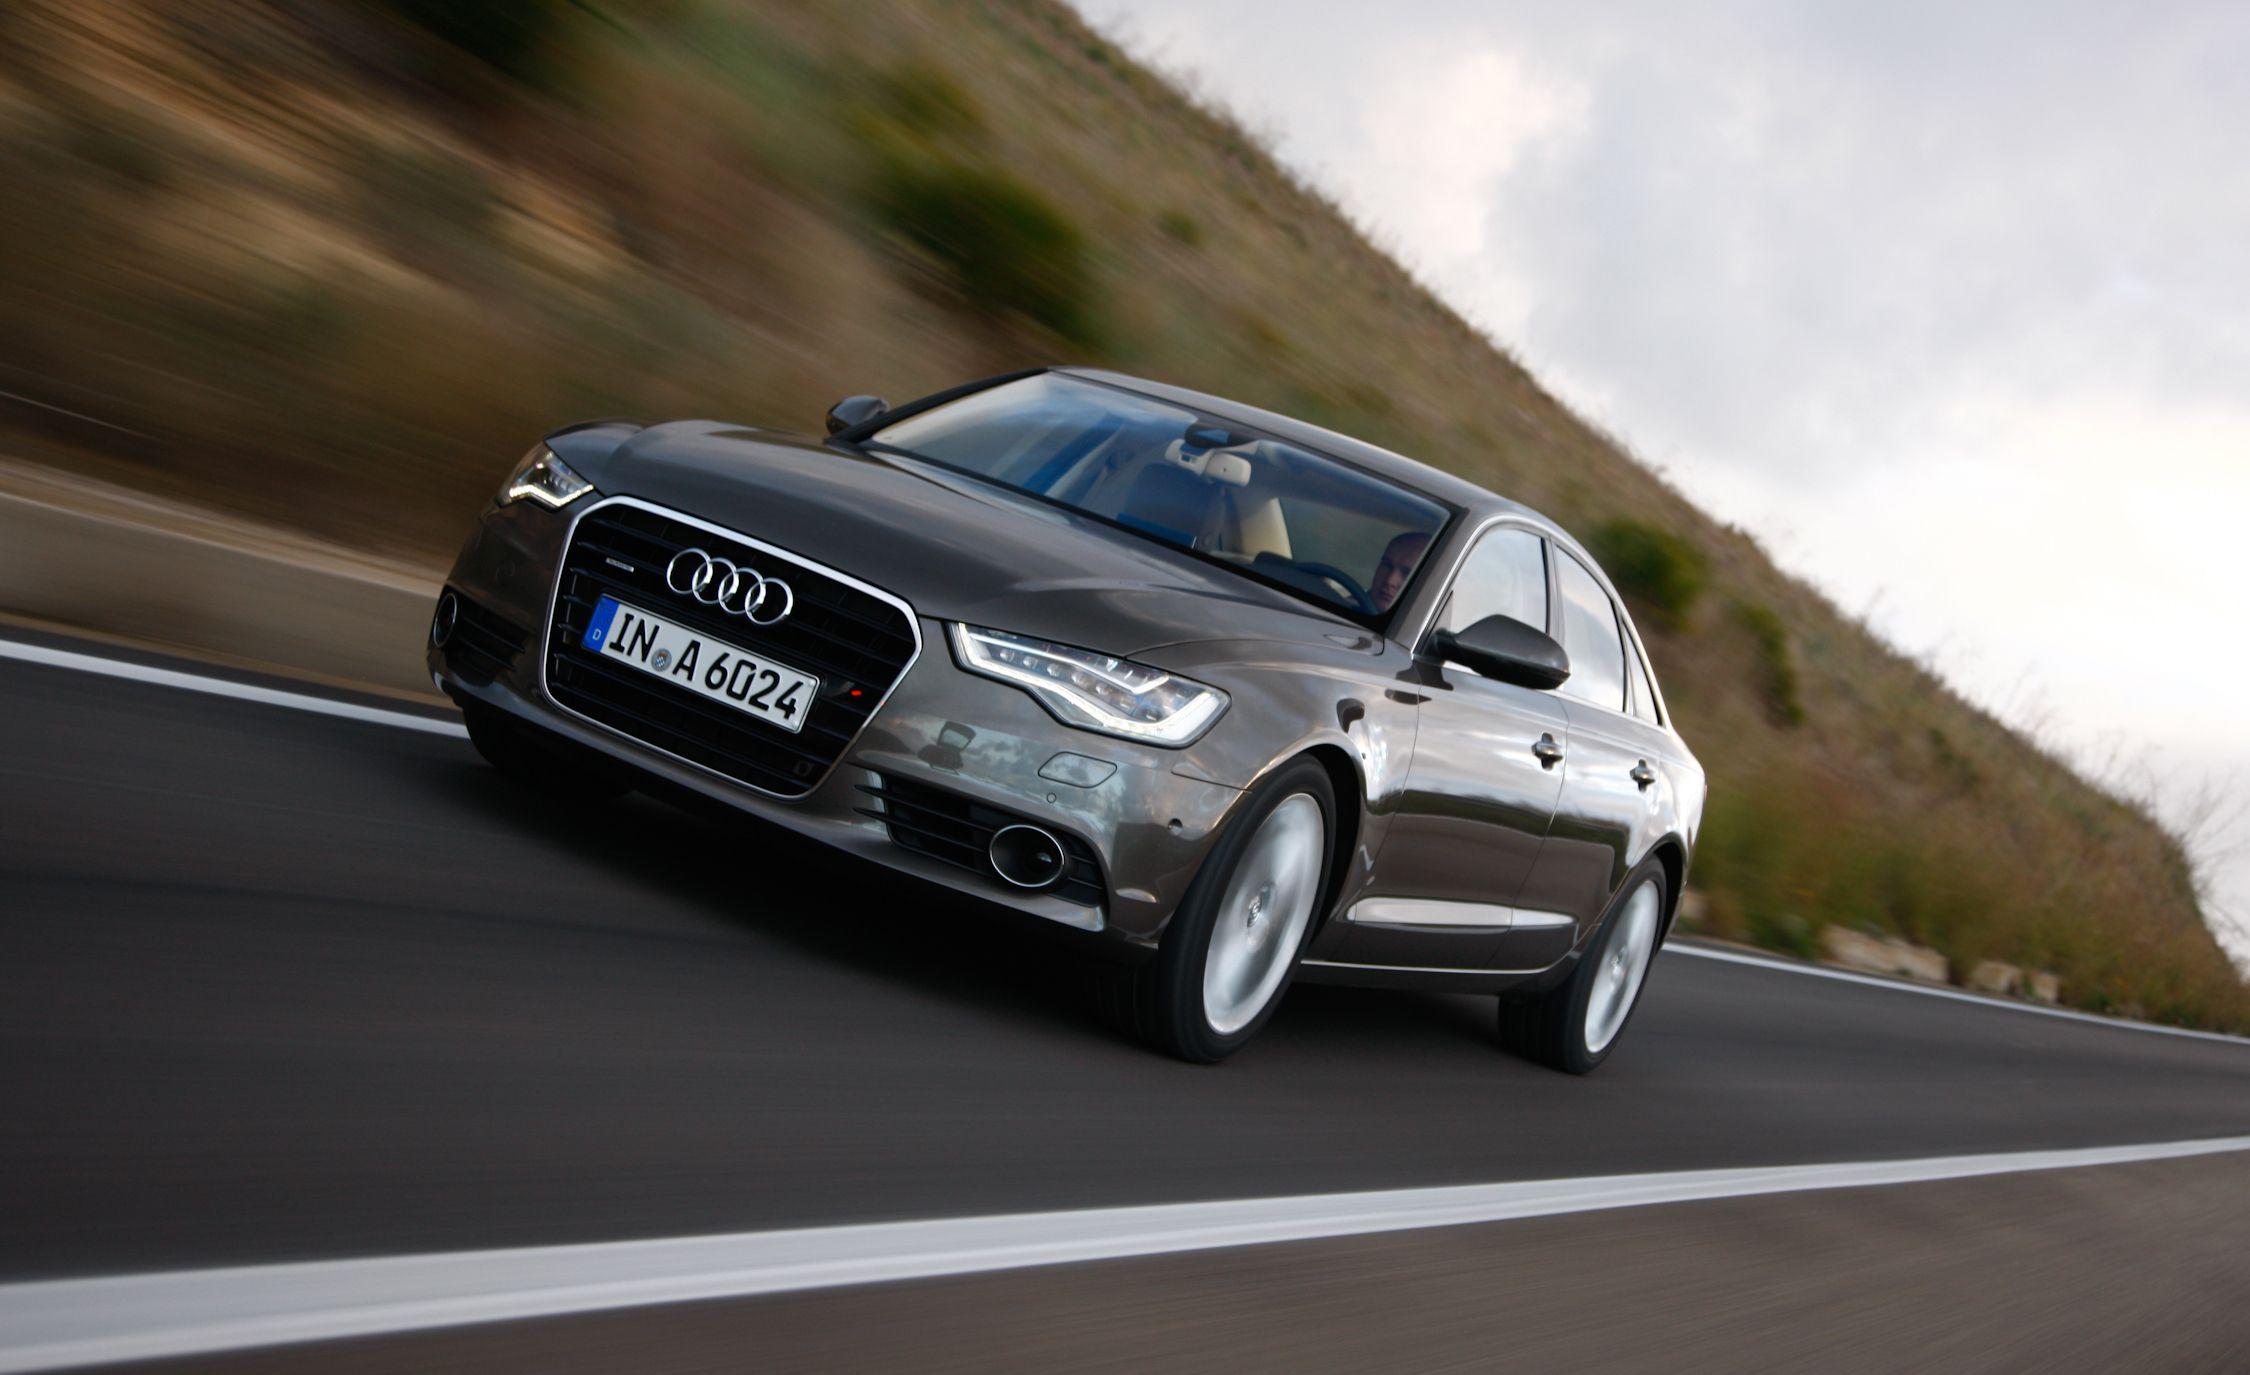 2012 audi a6 supercharged horsepower